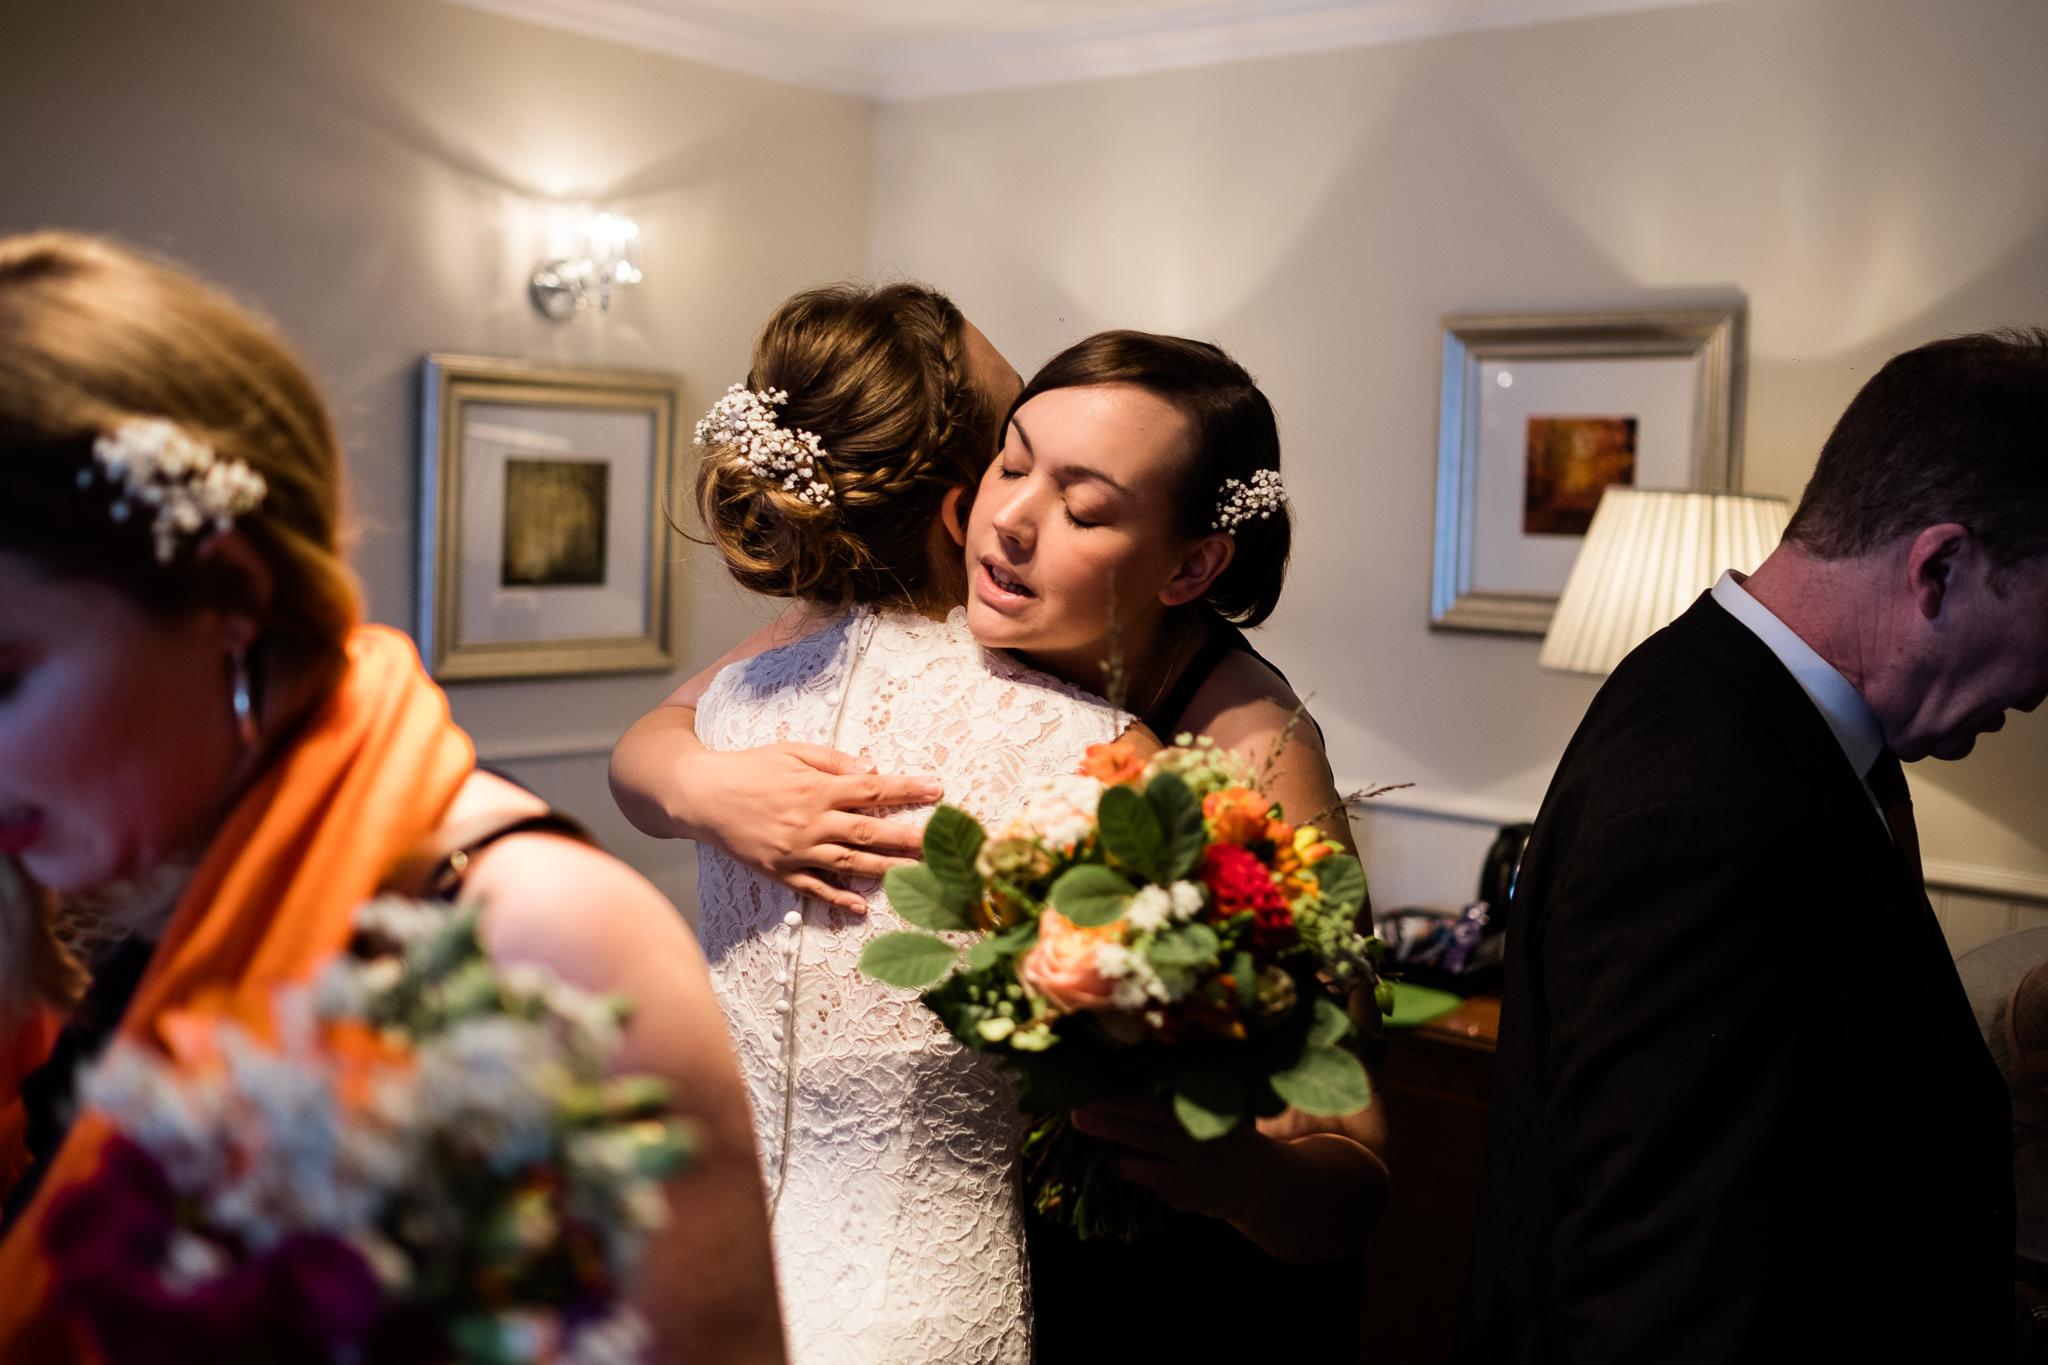 Relaxed Documentary Wedding Photography at The Wizard Inn, Alderley Edge Cheshire - Jenny Harper-12.jpg